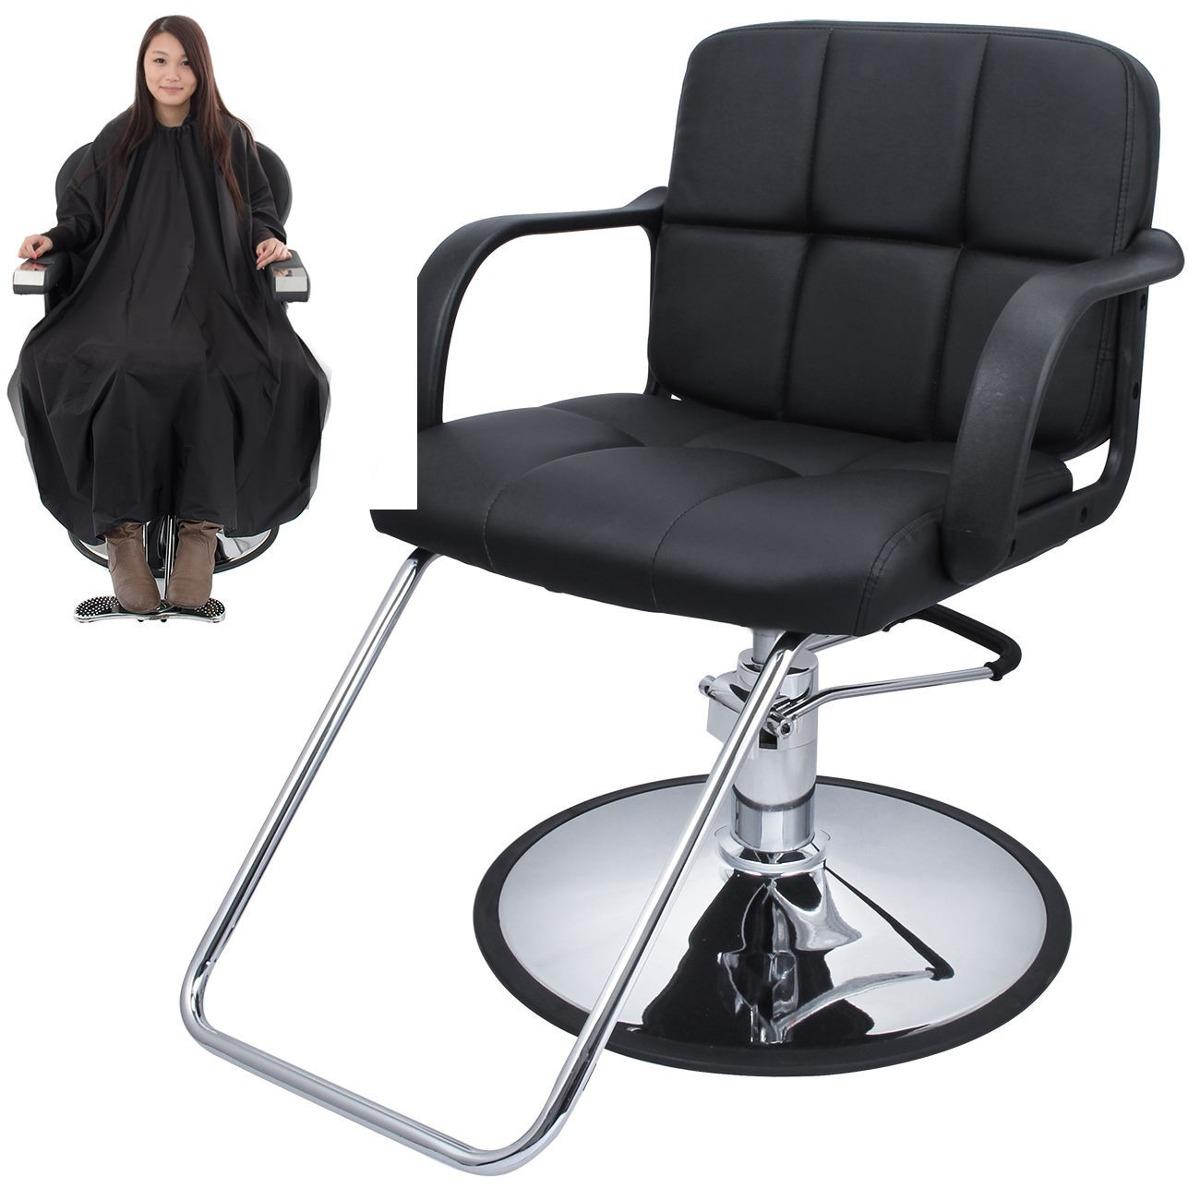 Silla Giratoria Hidraulica Salon Estetica Barberia Cabello   357400 en Mercado Libre